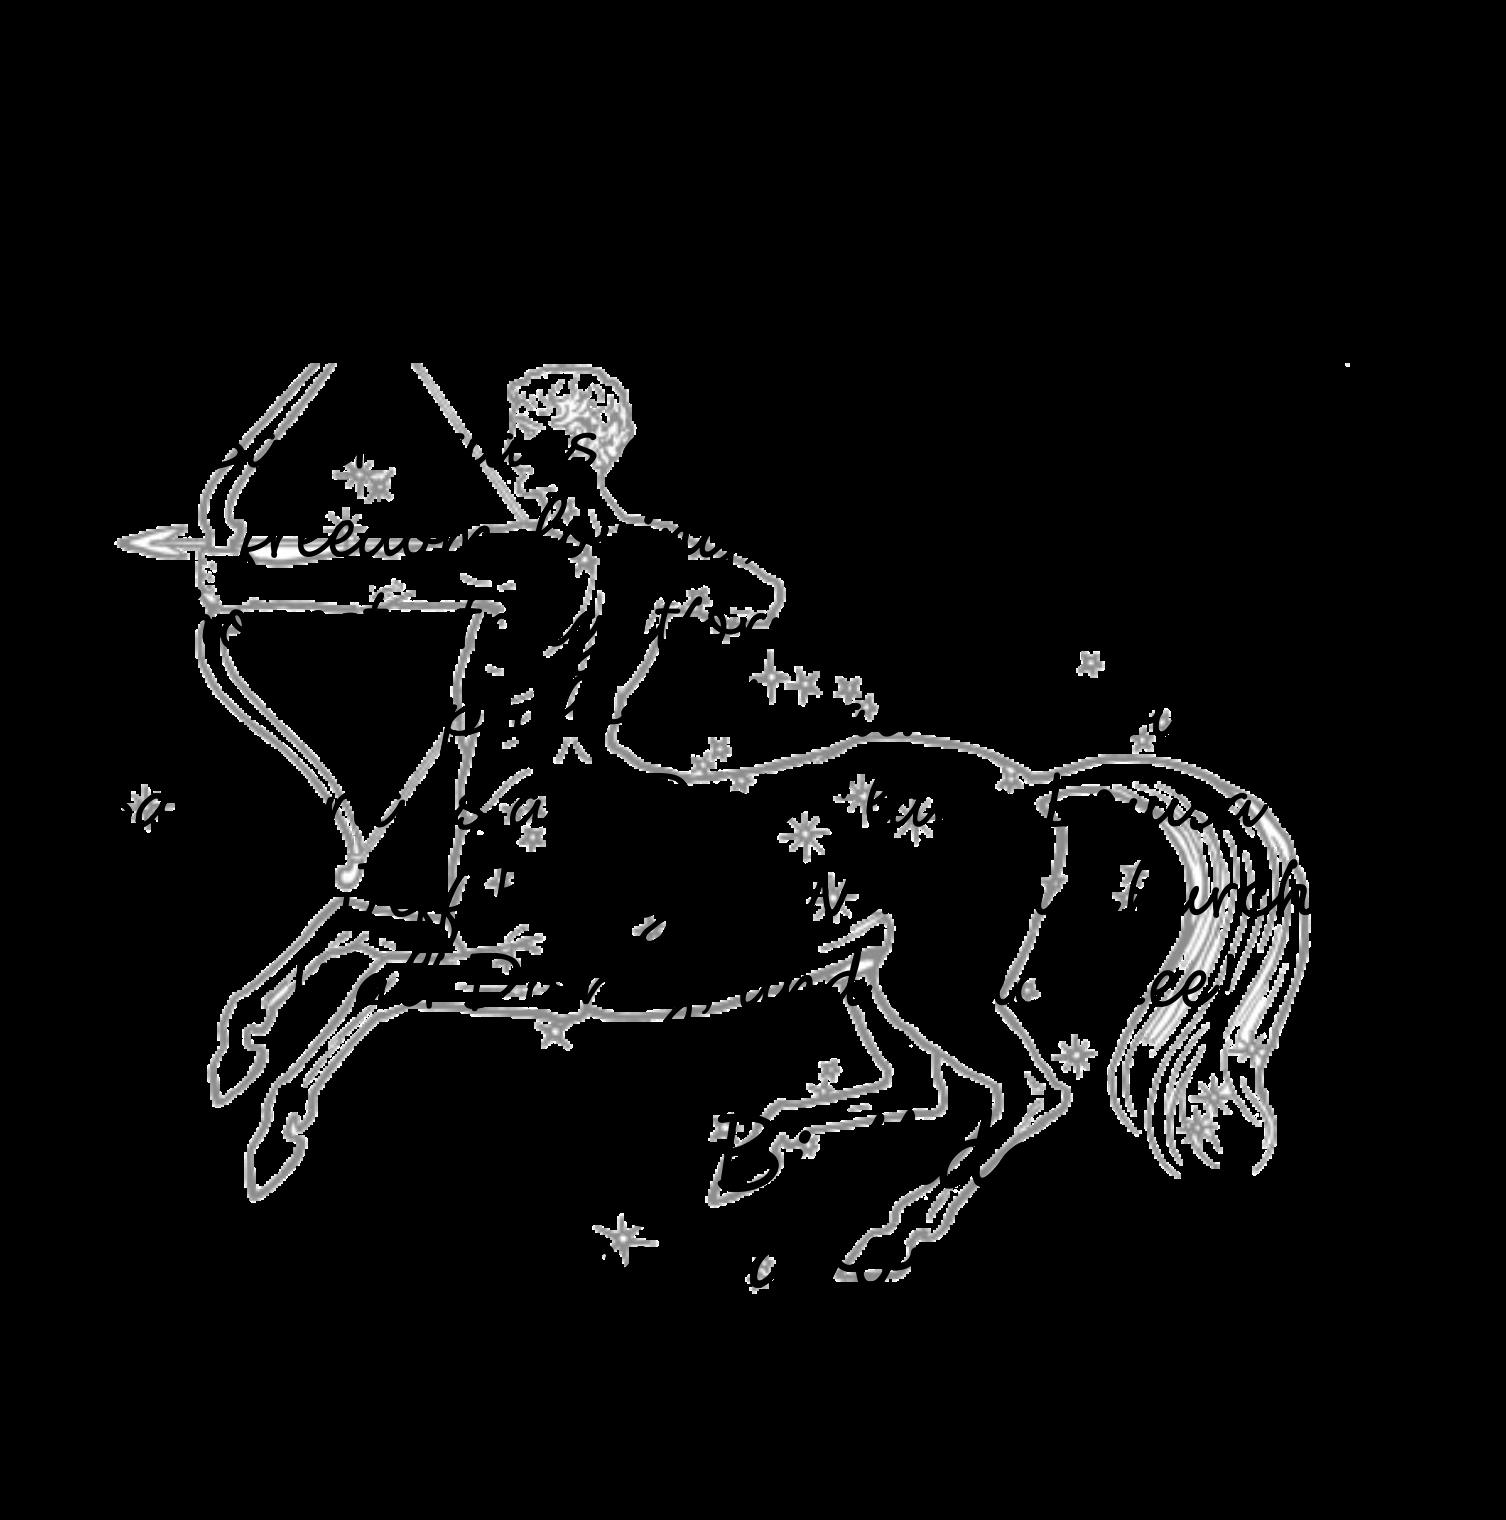 Free astrological chart 2014